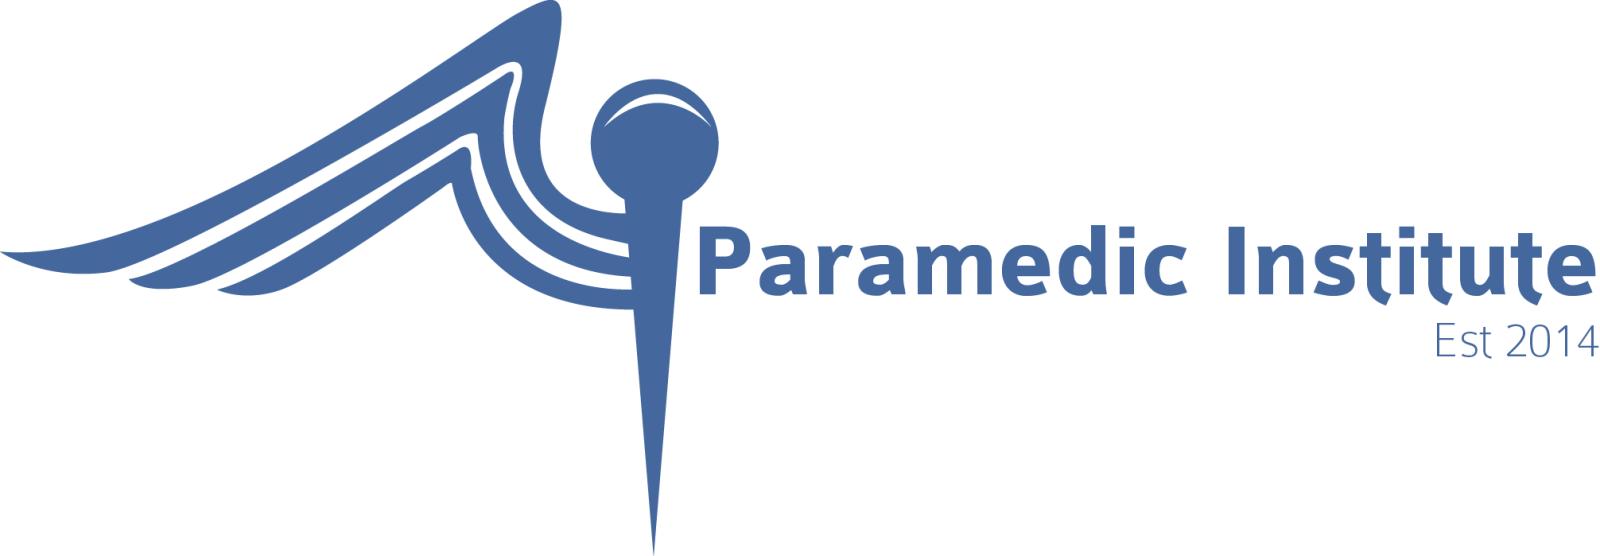 Paramedicr